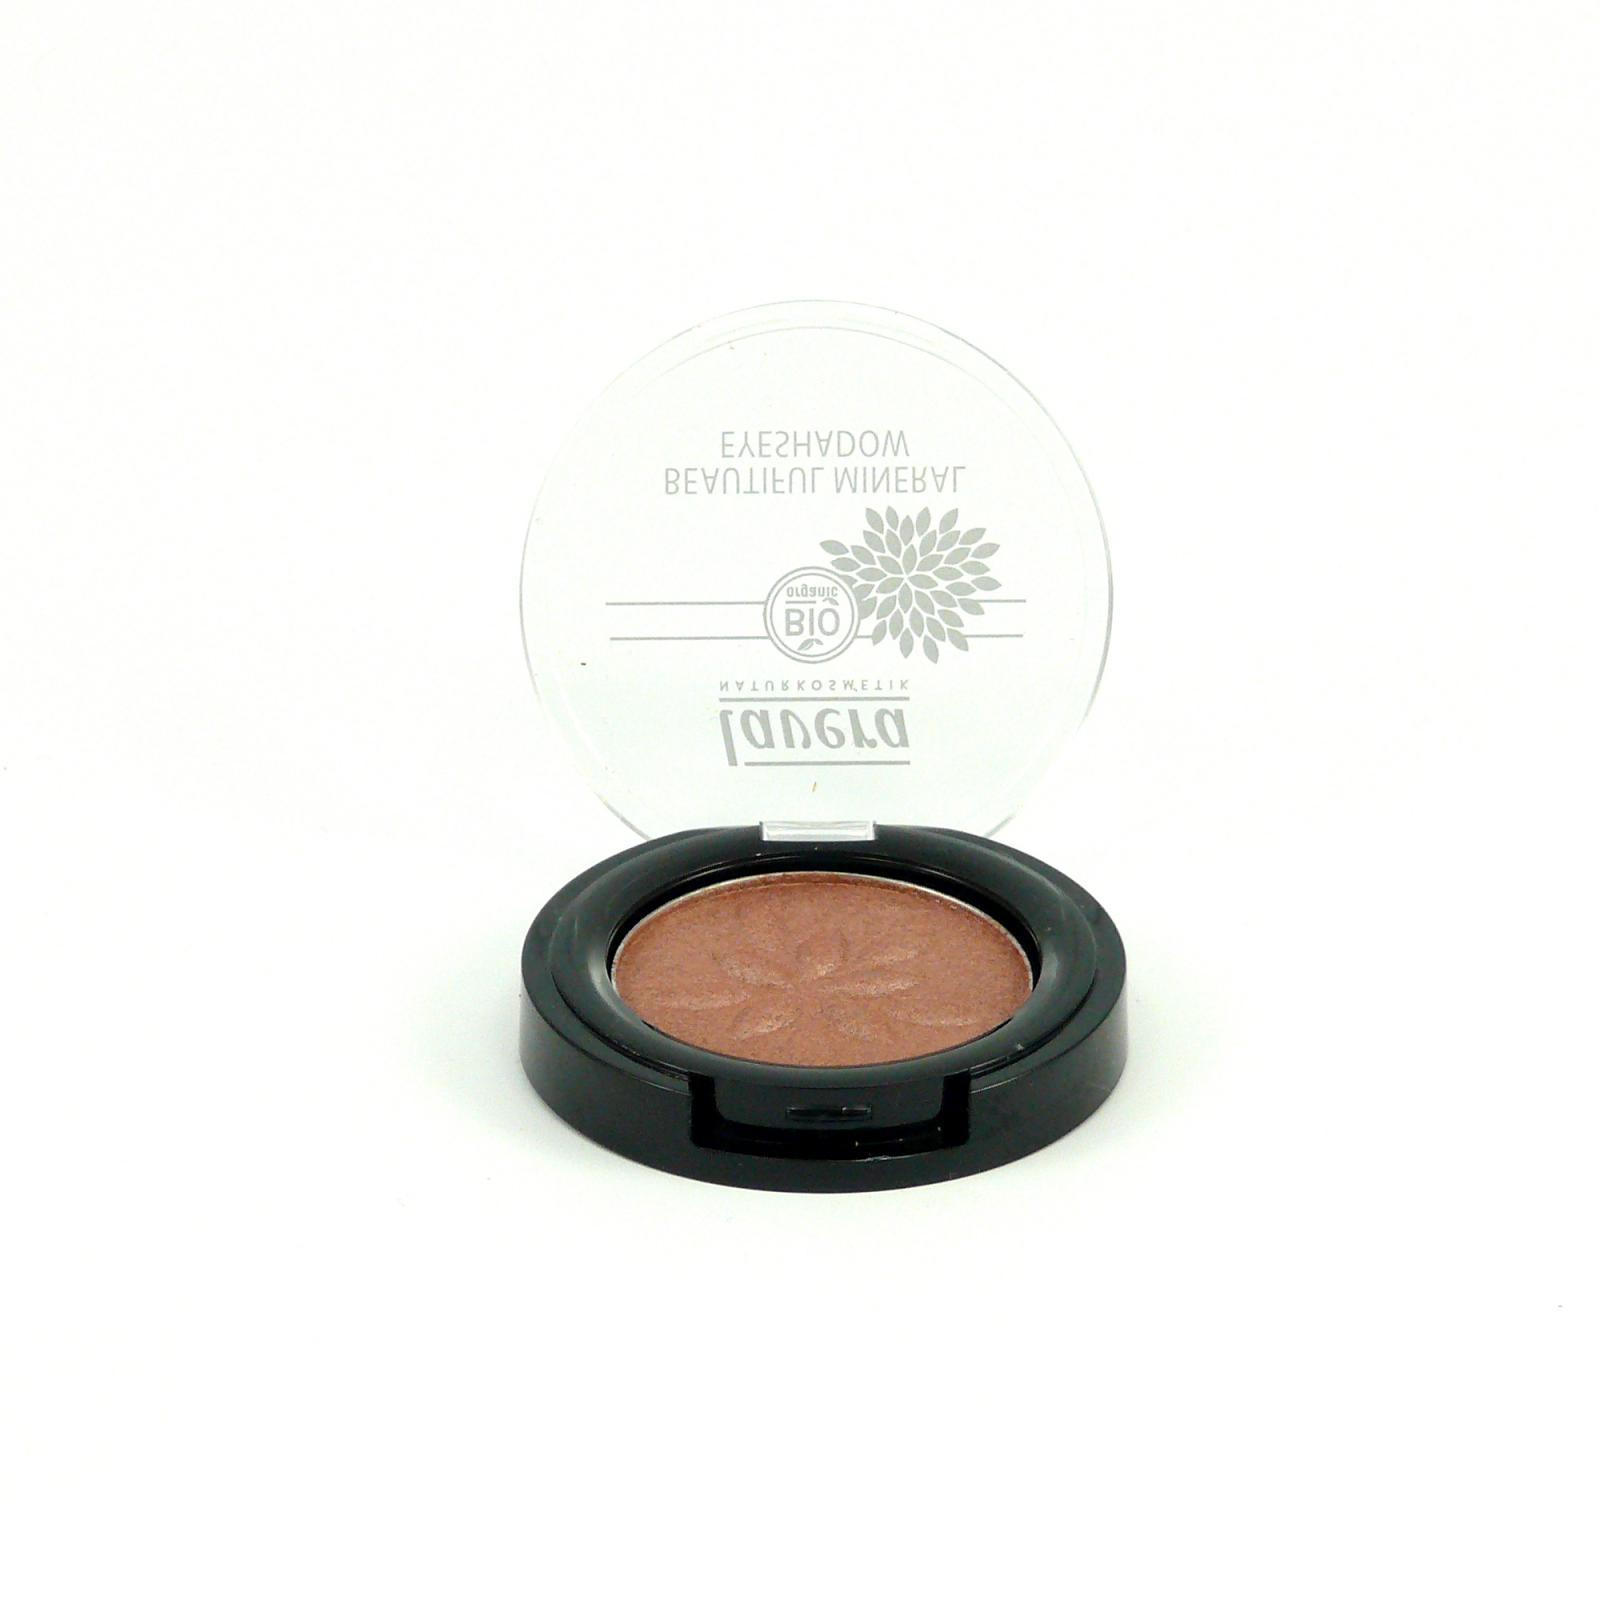 Lavera Oční stíny MONO 03 latté macchiato, Trend Sensitive 2014 2 g